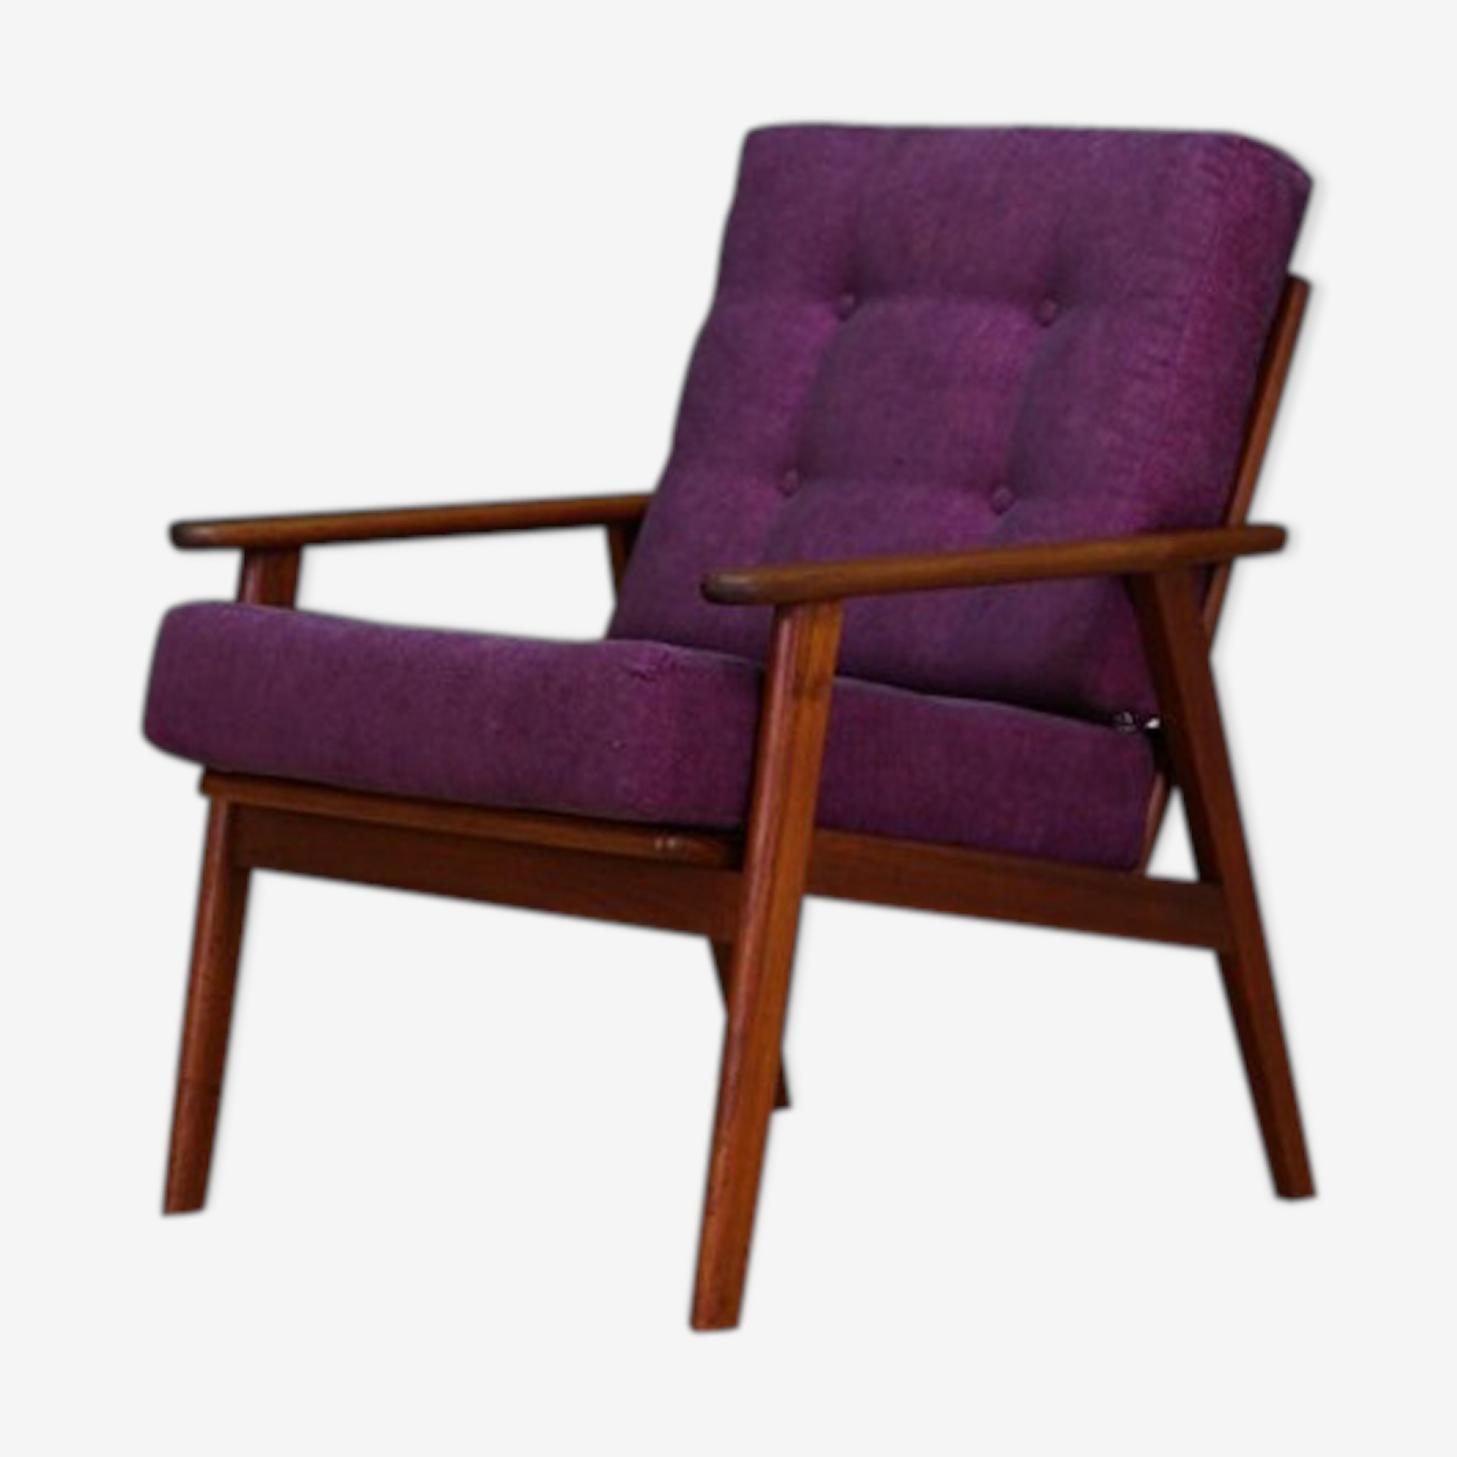 Fauteuil design danois original classique